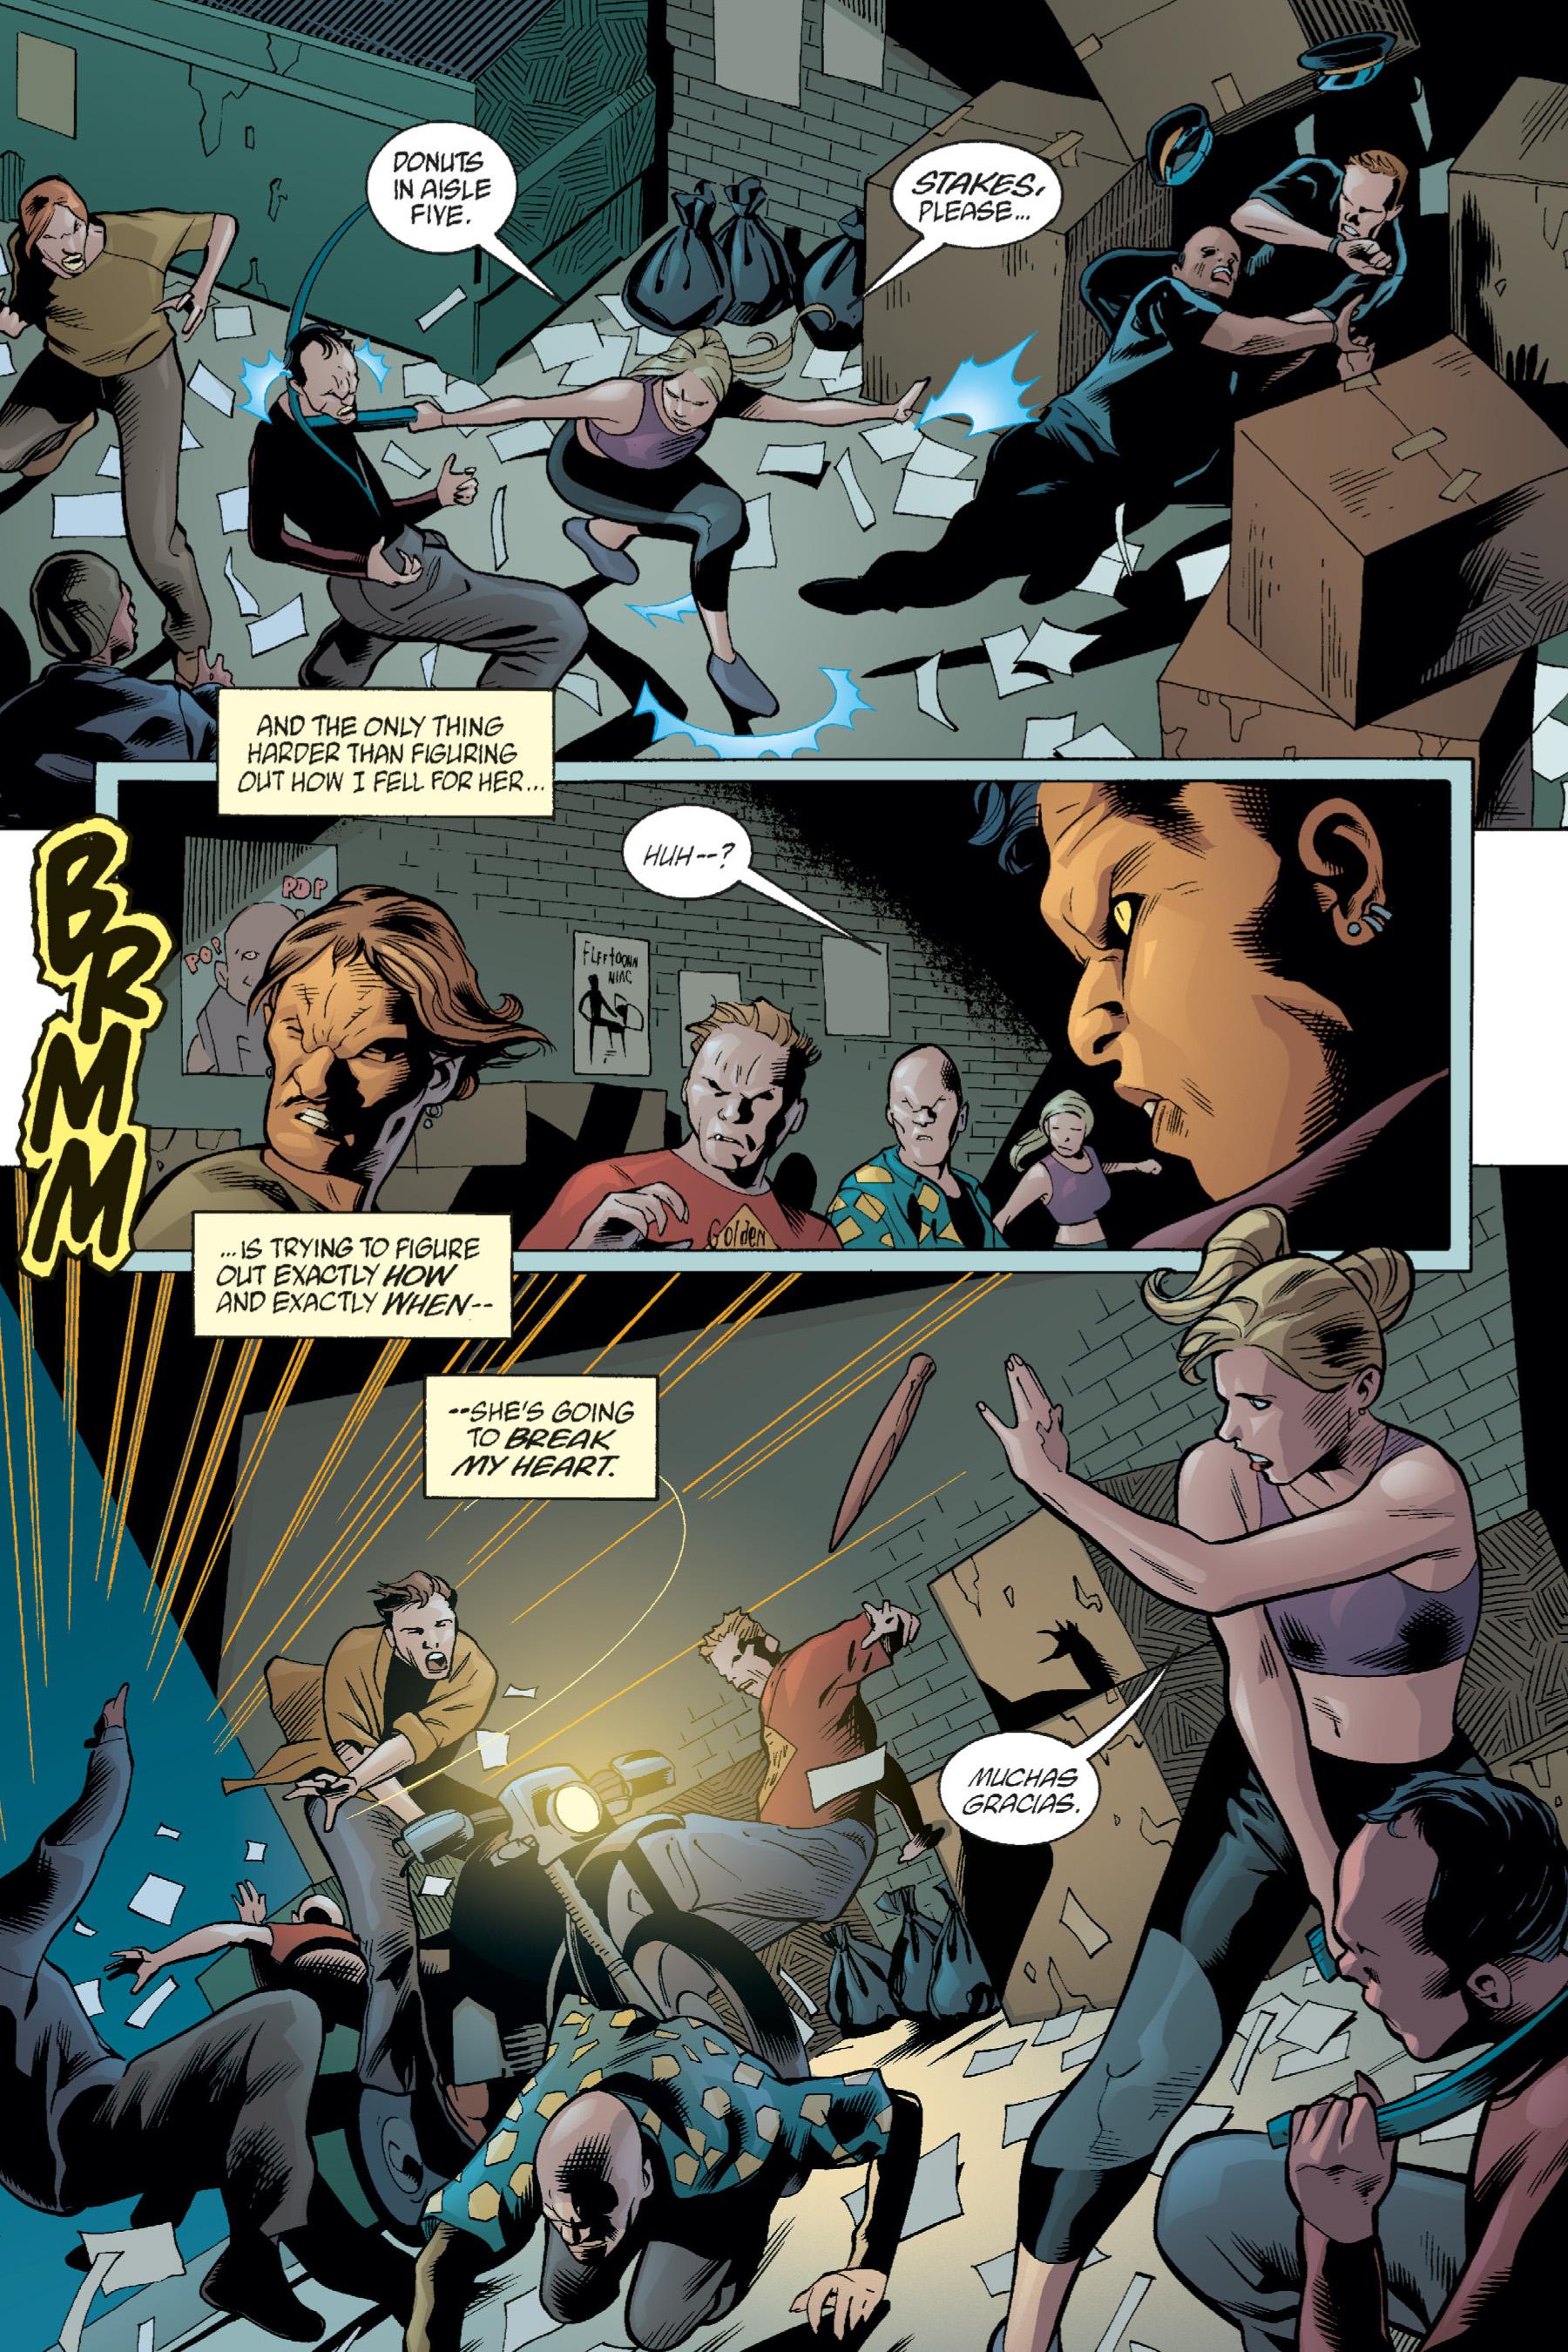 Read online Buffy the Vampire Slayer: Omnibus comic -  Issue # TPB 1 - 107